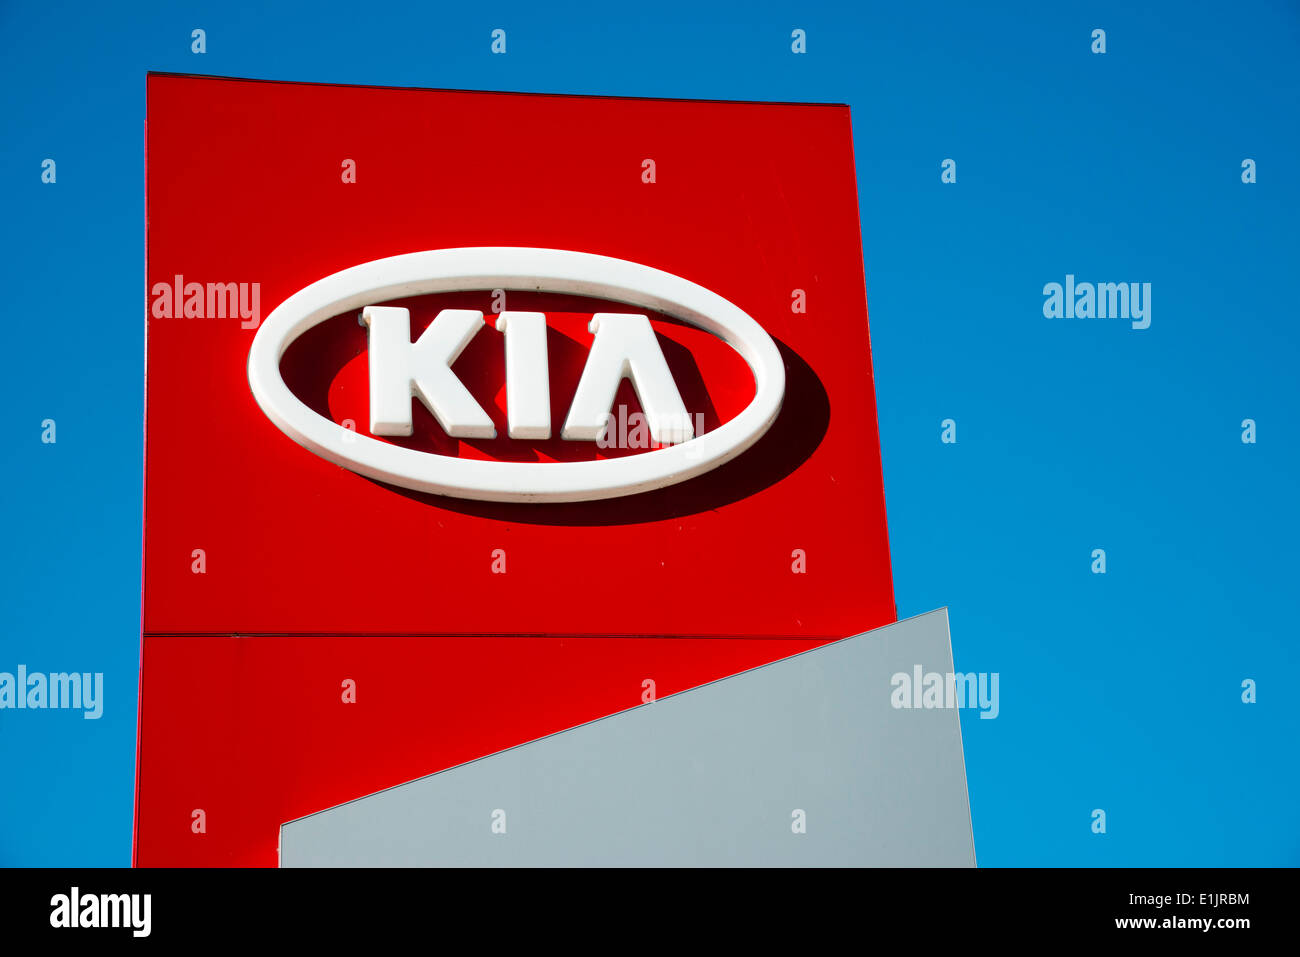 Kia motors sign at a car dealership, UK. - Stock Image